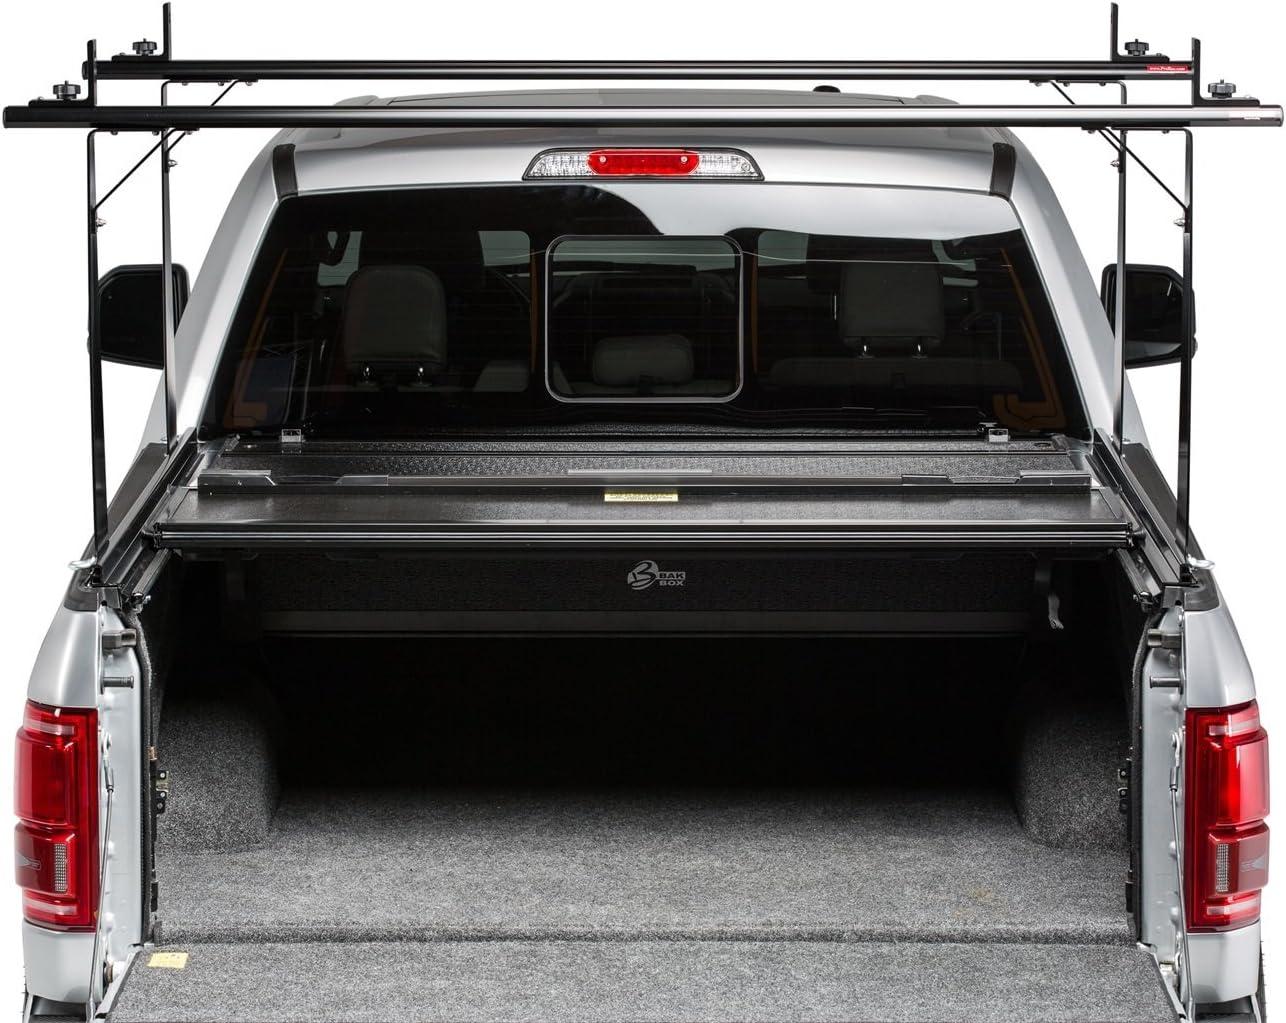 bak industries 26126bt bakflip cs hard folding truck bed cover integrated rack system black aluminum textured black finish bakflip cs hard folding